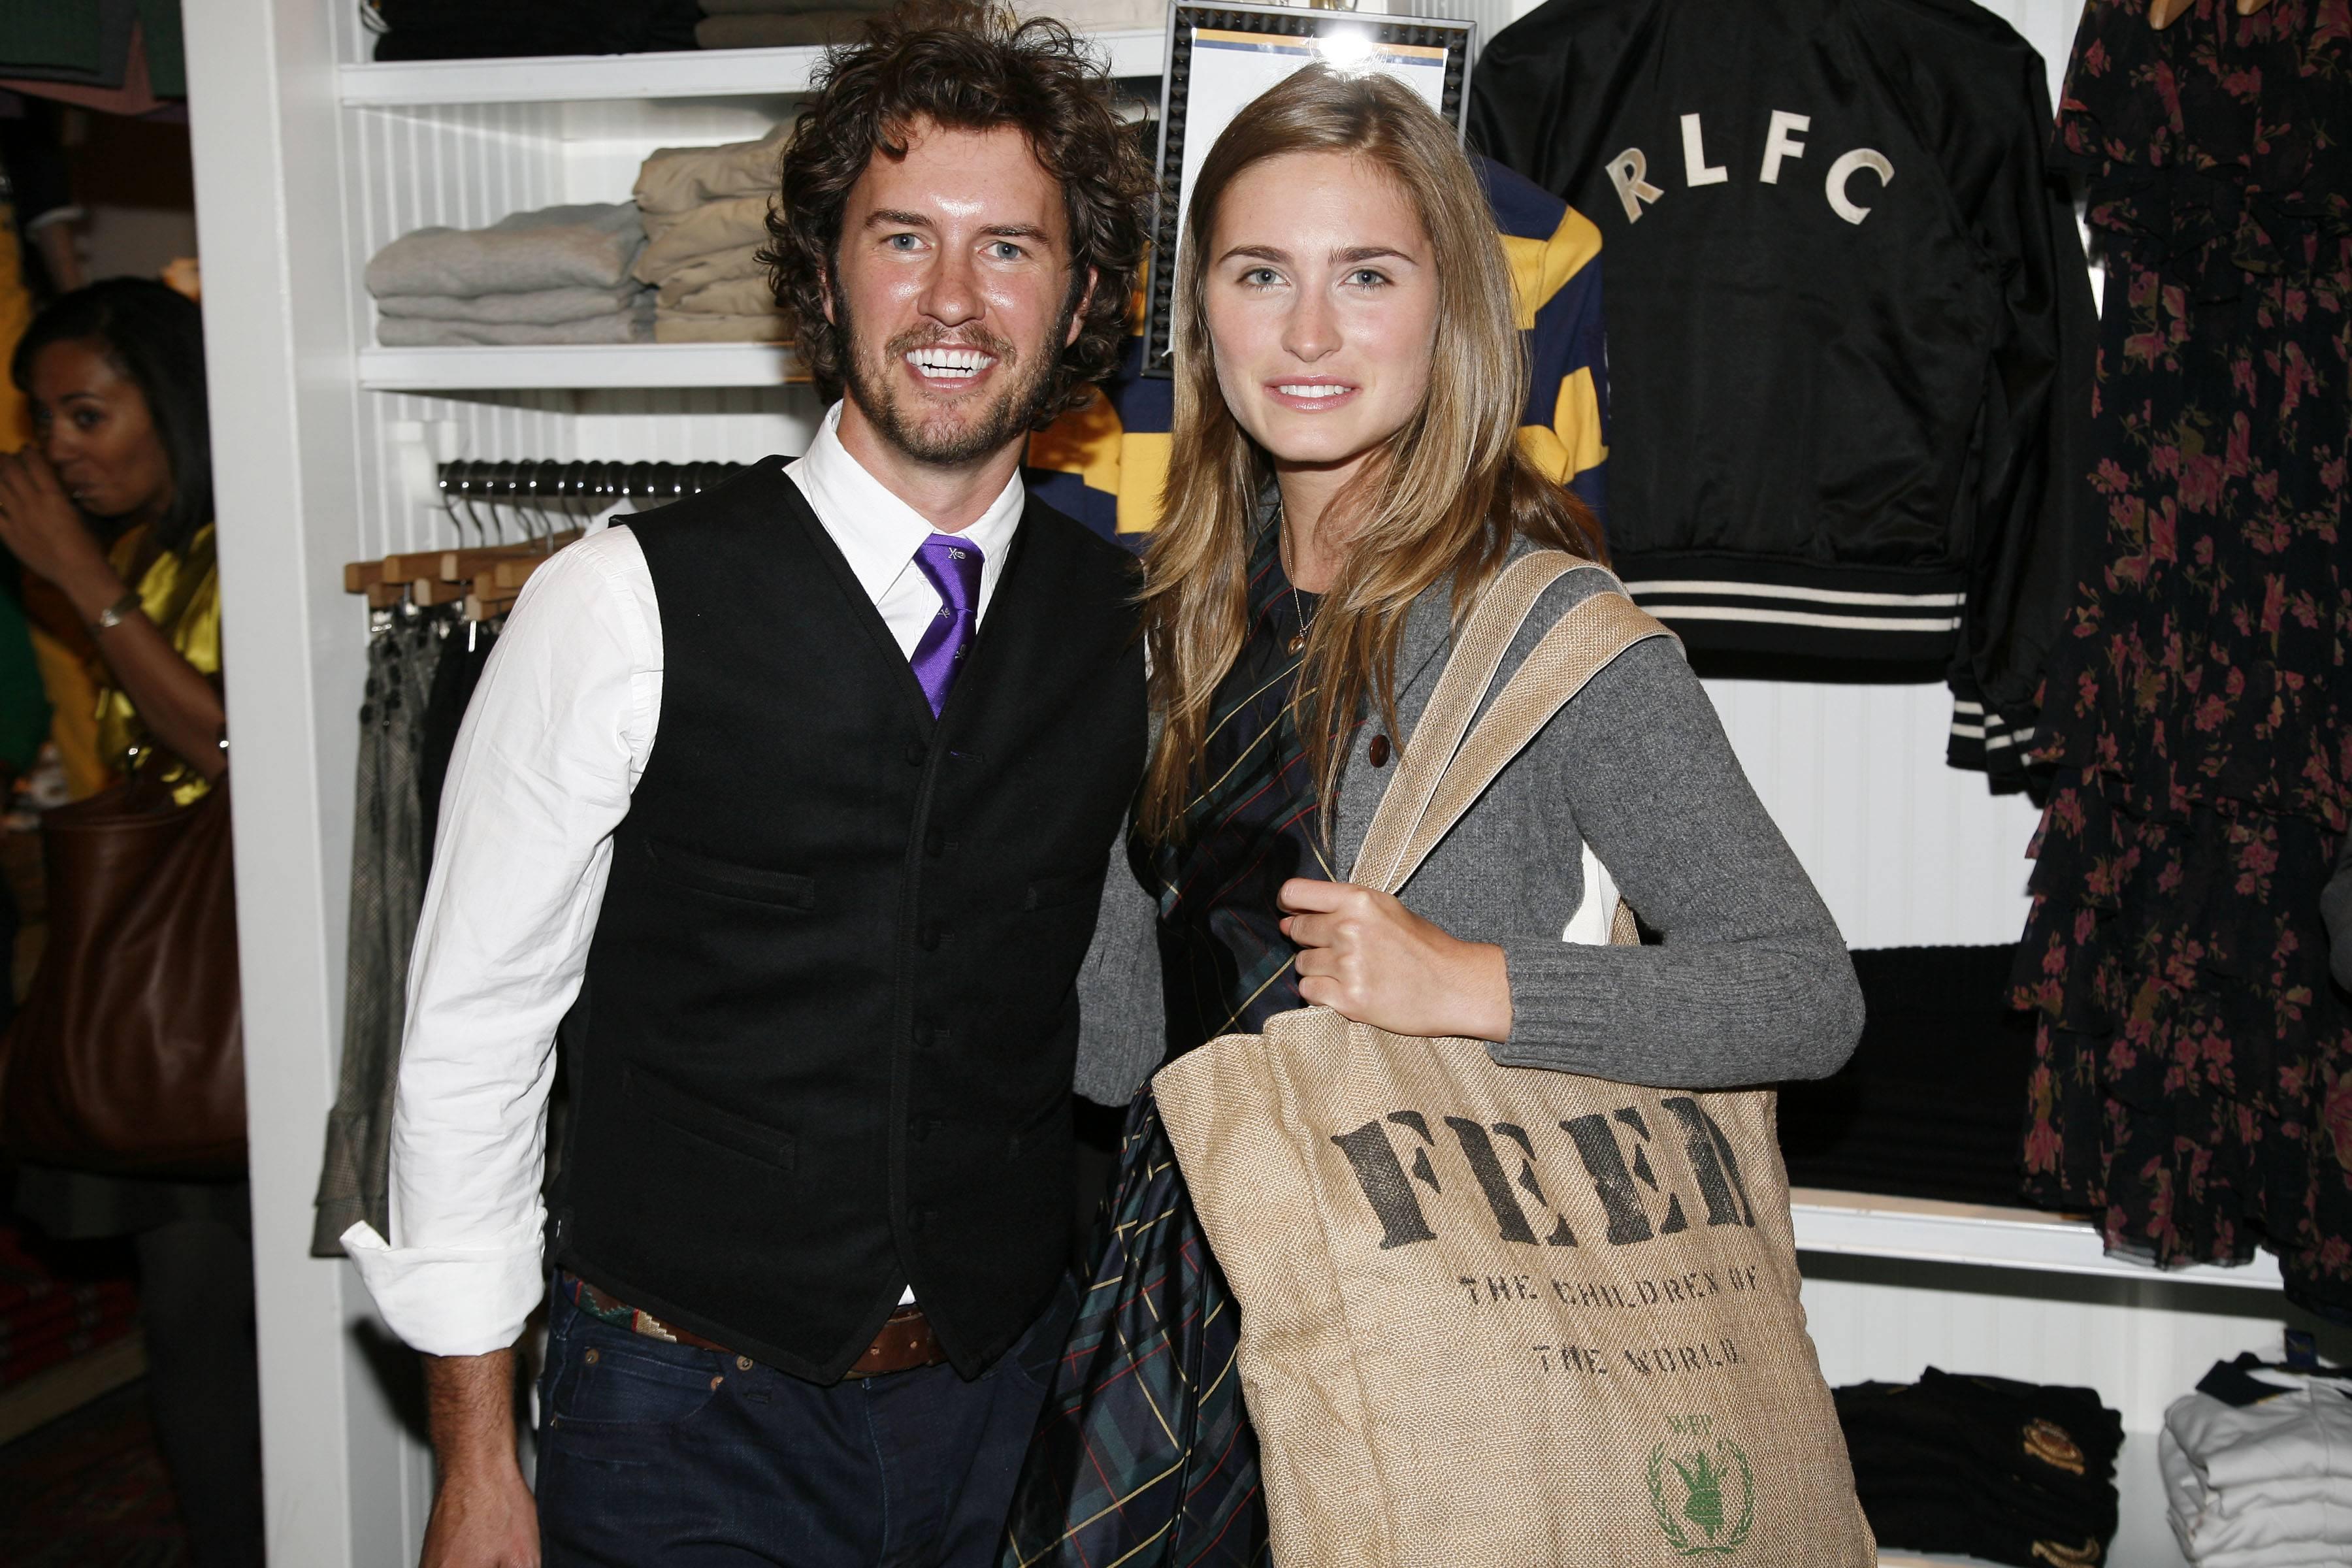 Blake and Lauren